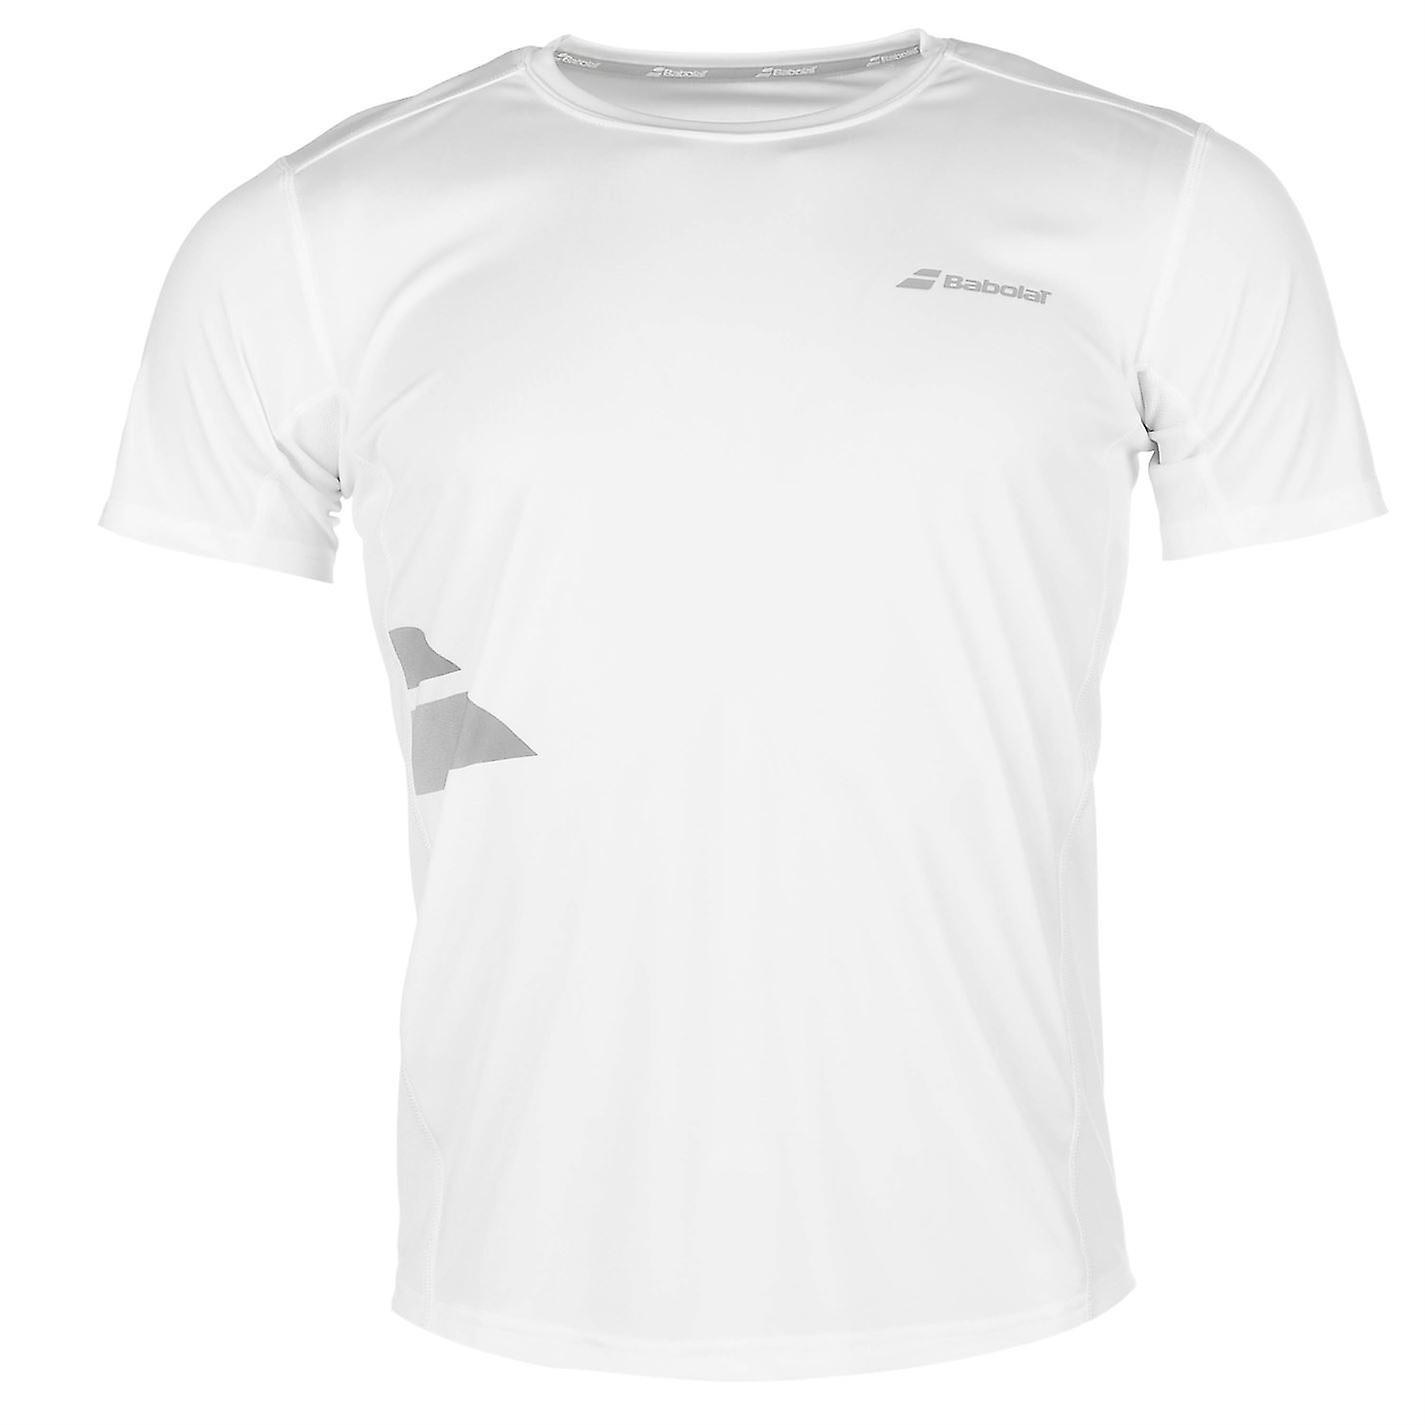 ONeill onde Manica Corta T-shirt in rose shadow